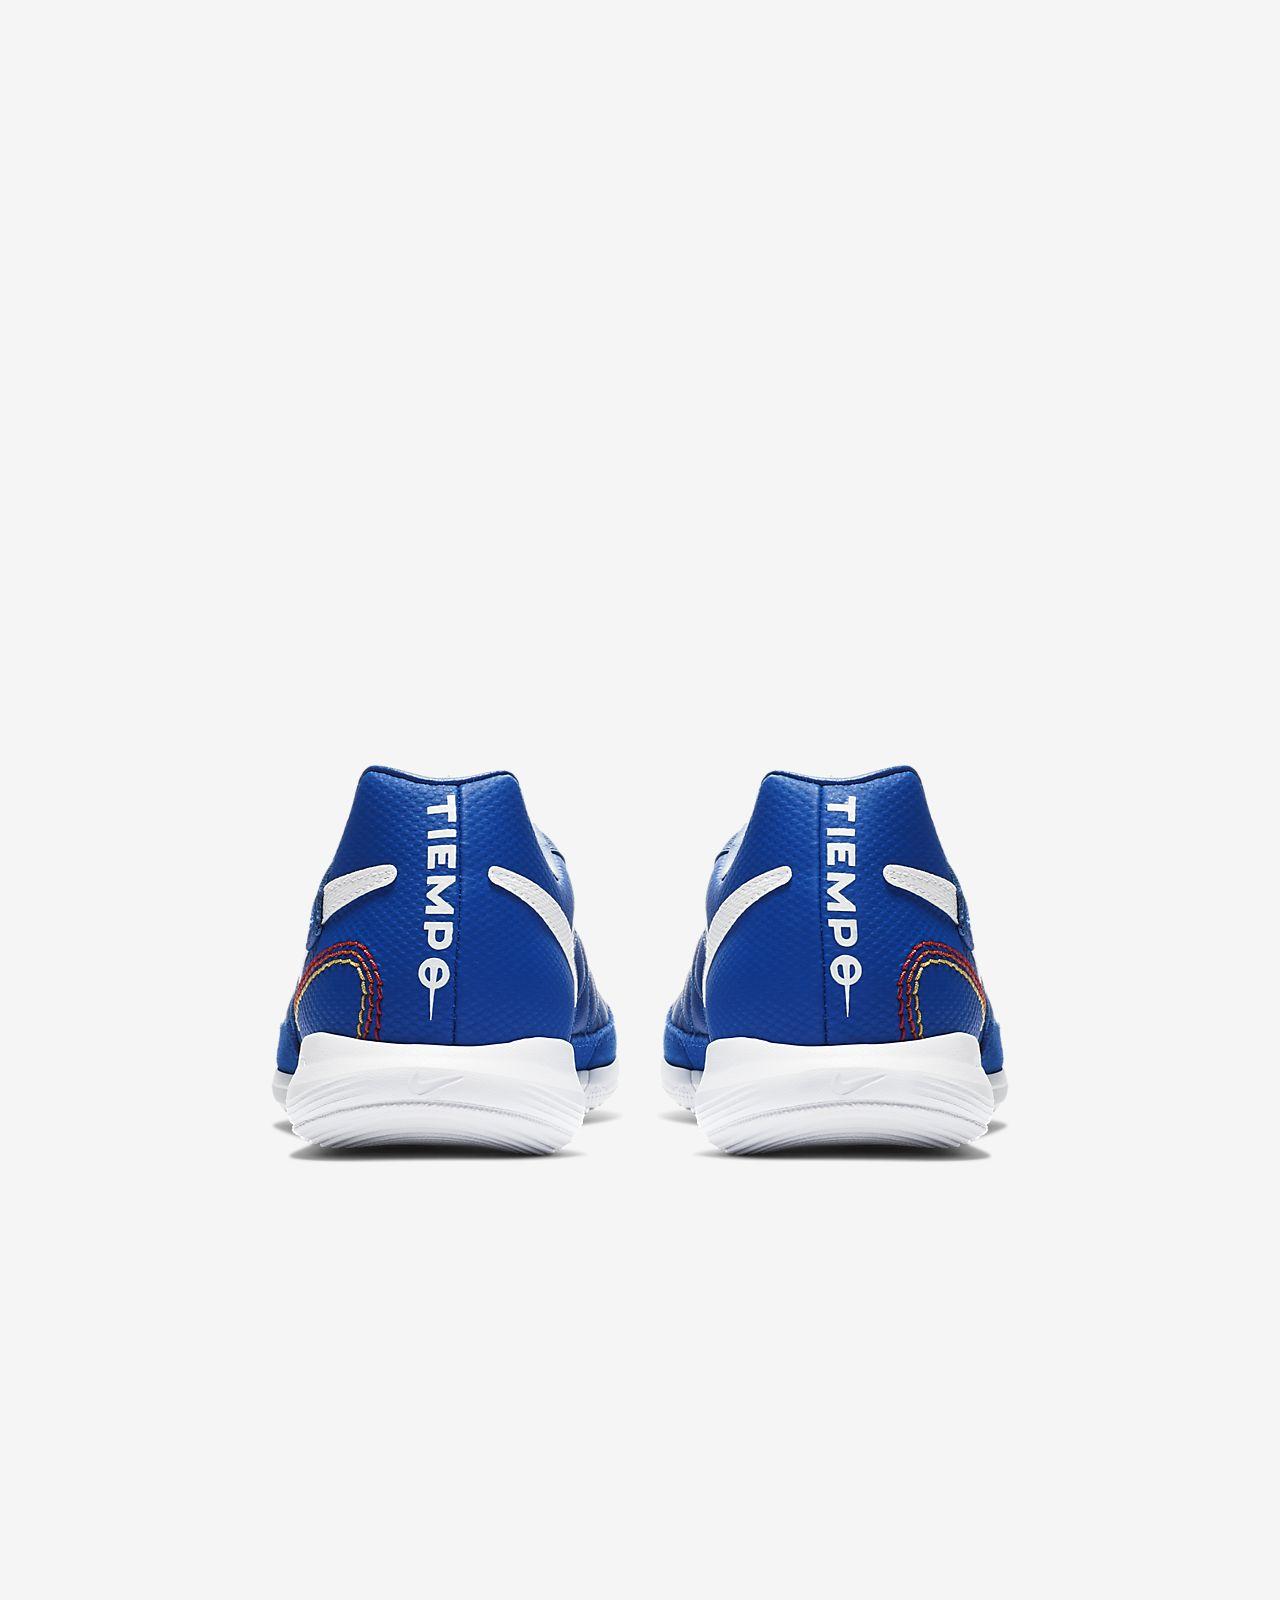 detailed look 01e74 f0d5d ... Nike TiempoX Lunar Legend VII Pro 10R Indoor Court Soccer Shoe